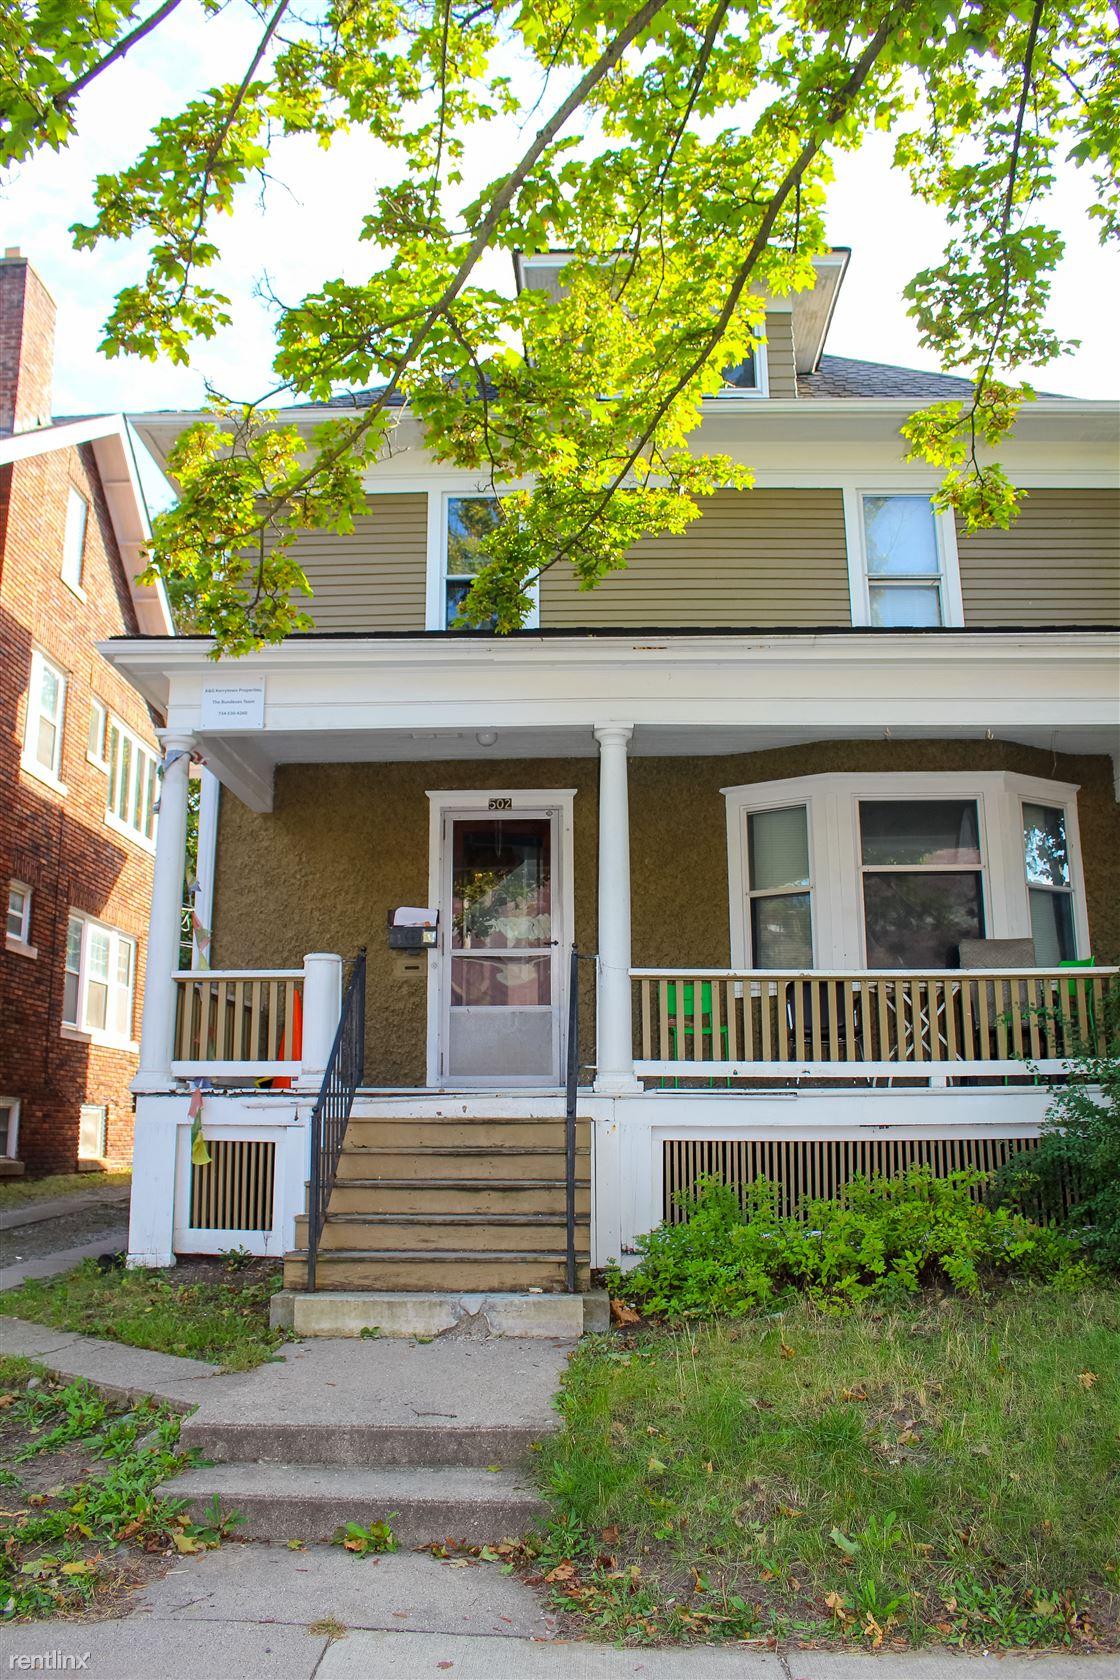 House for Rent in Ann Arbor